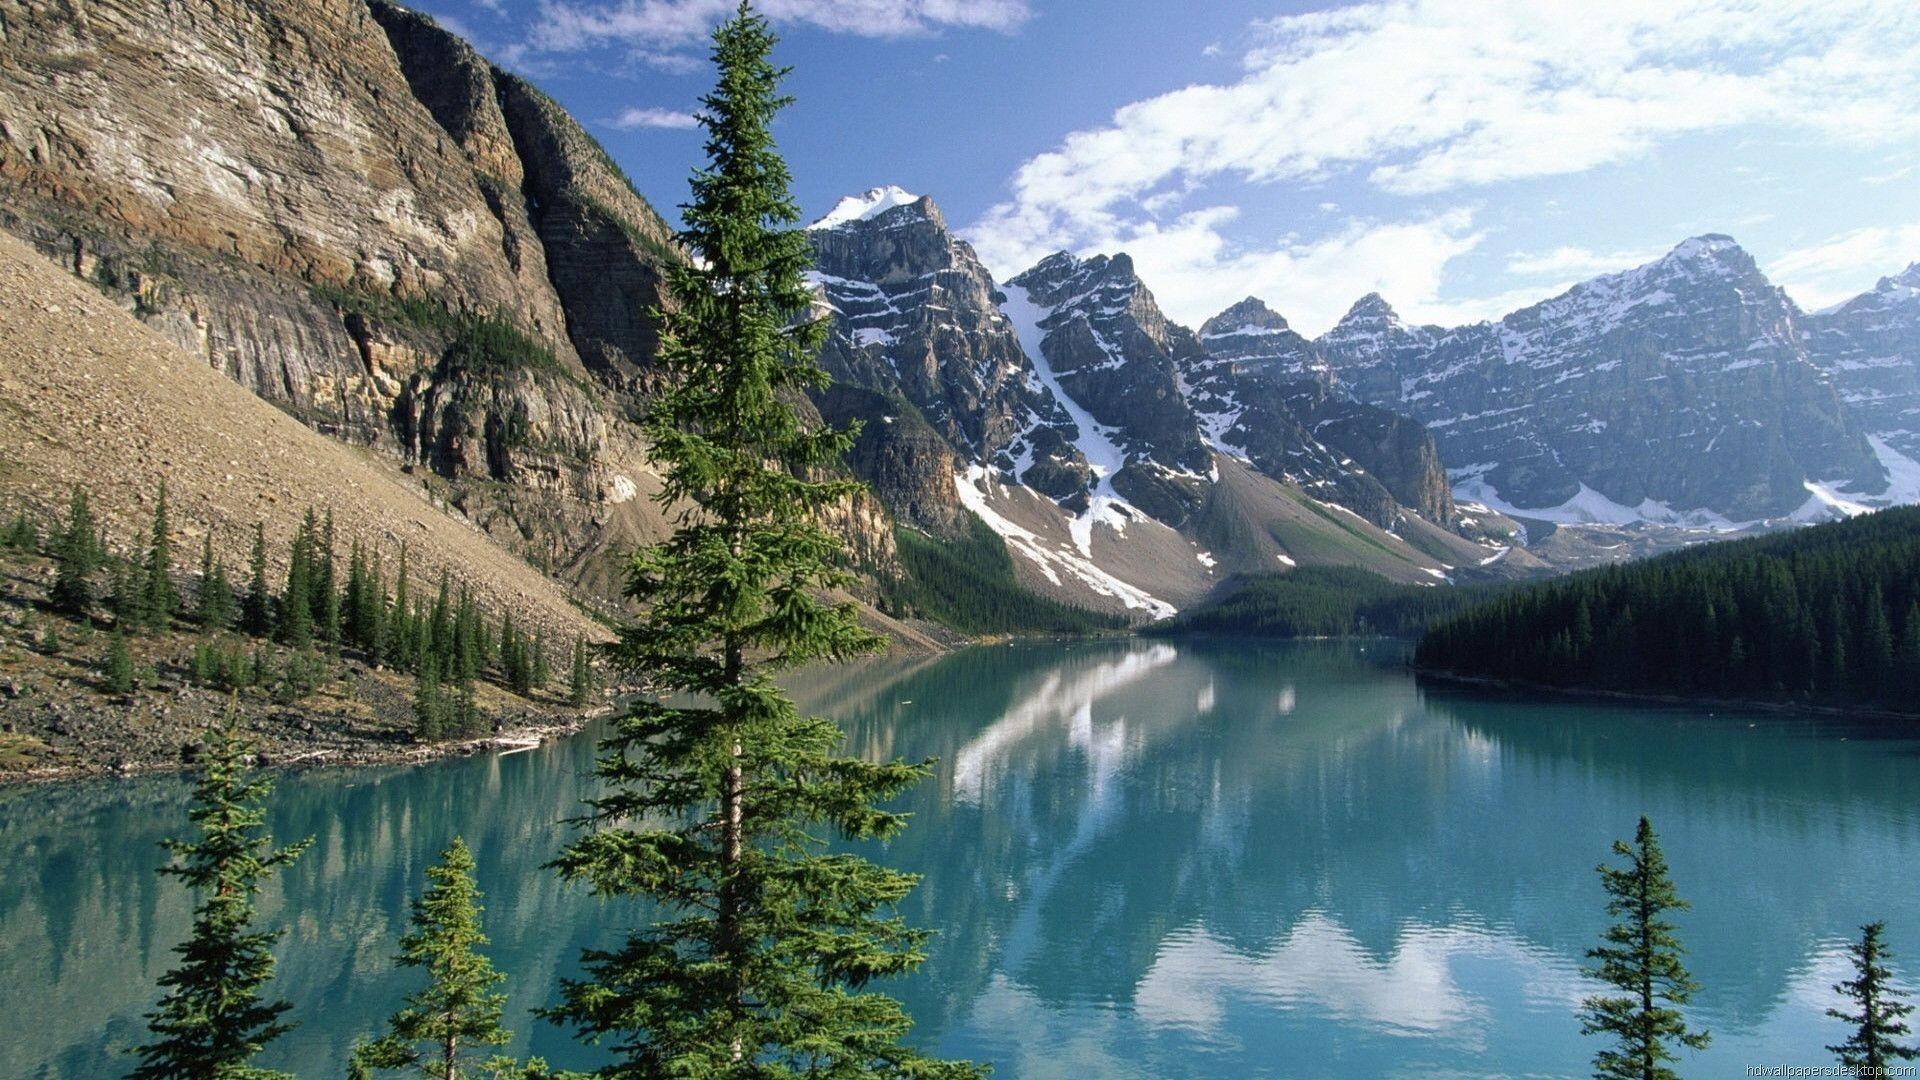 Nature Wallpapers, HD, 1080p, Desktop Background, .